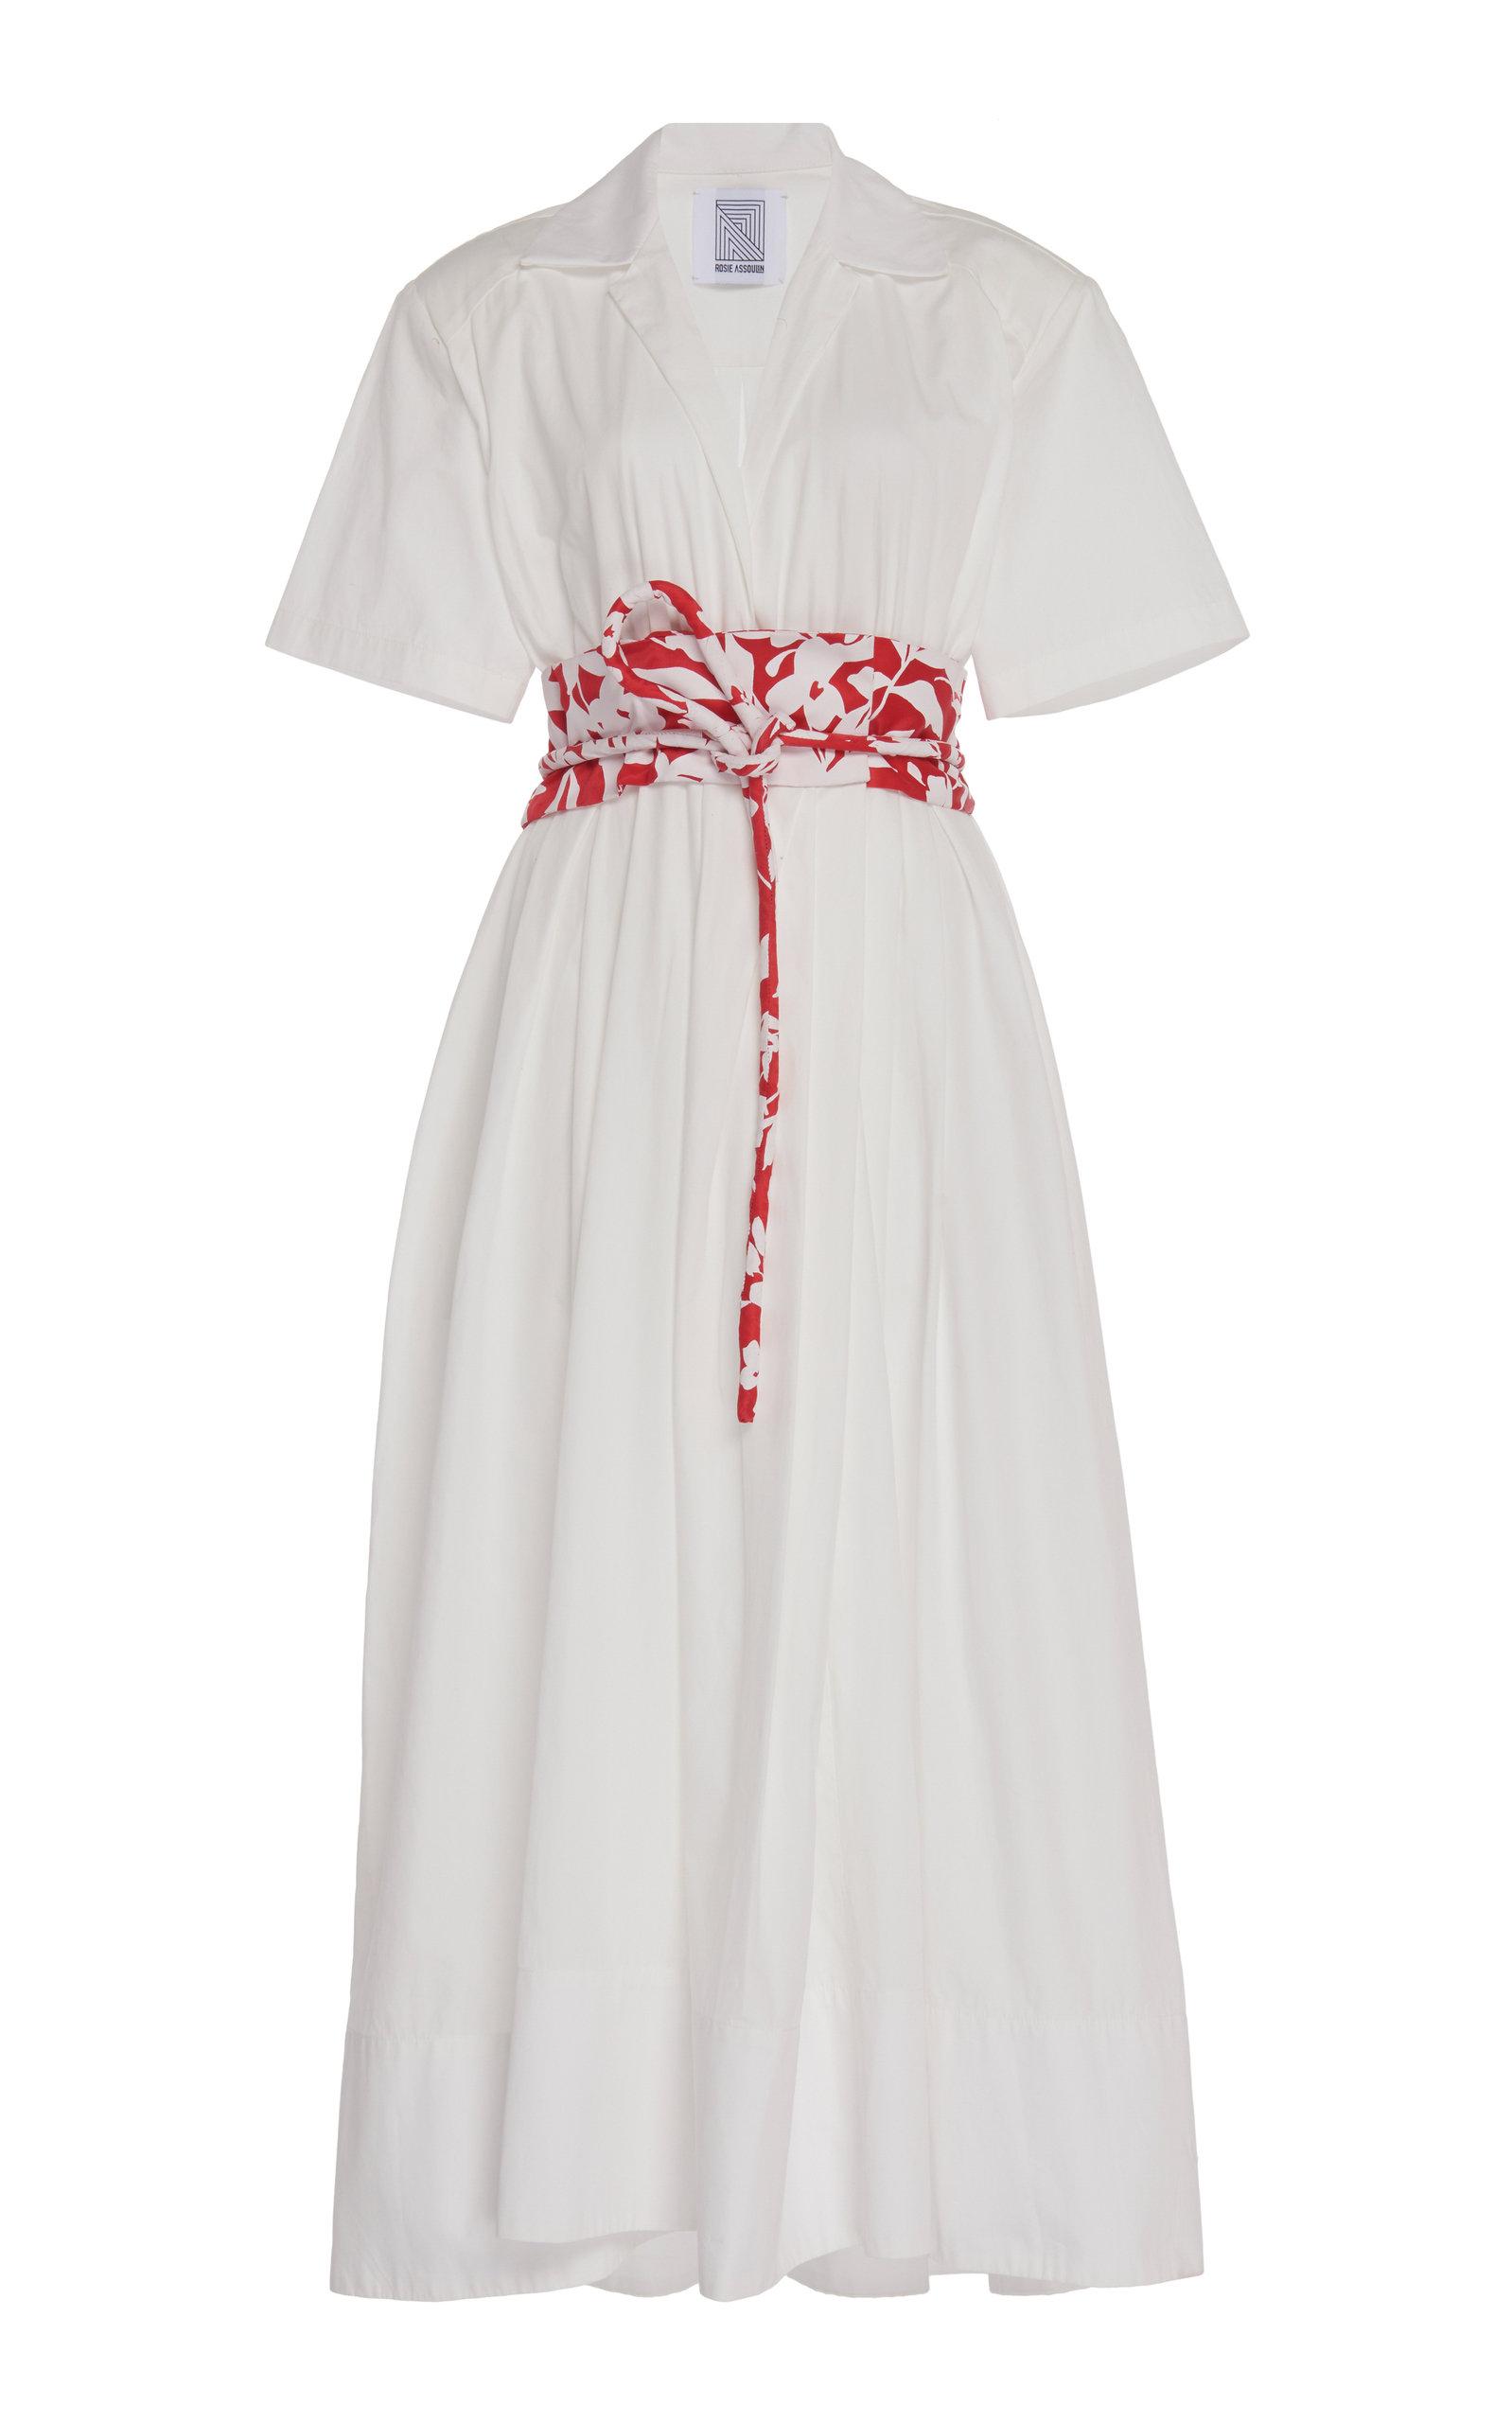 Buy Rosie Assoulin Belted Cotton-Poplin Shirt Dress online, shop Rosie Assoulin at the best price